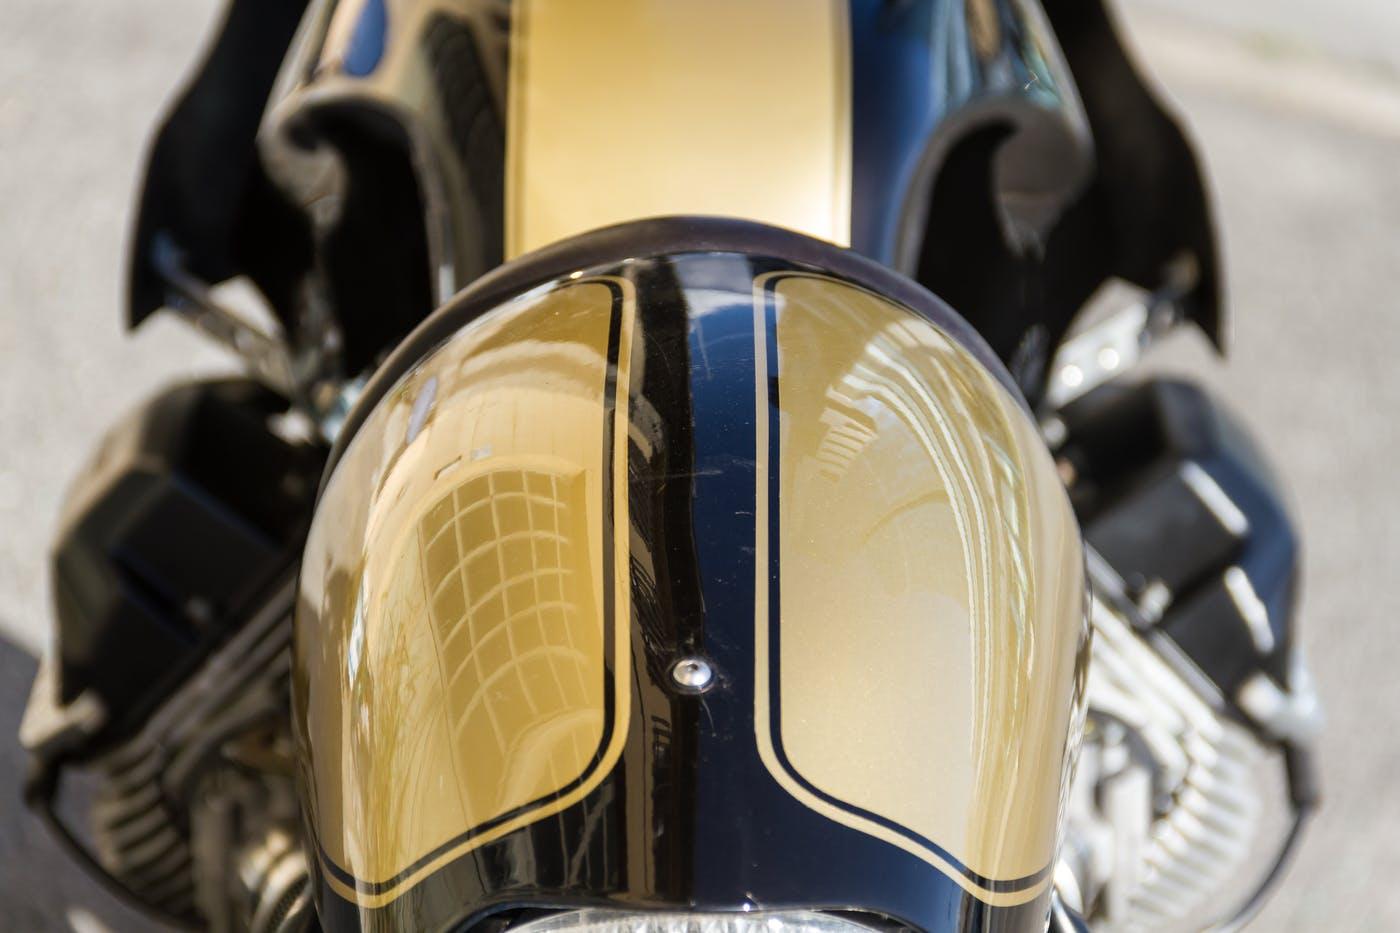 Guzzi V11 by Greaser Garage